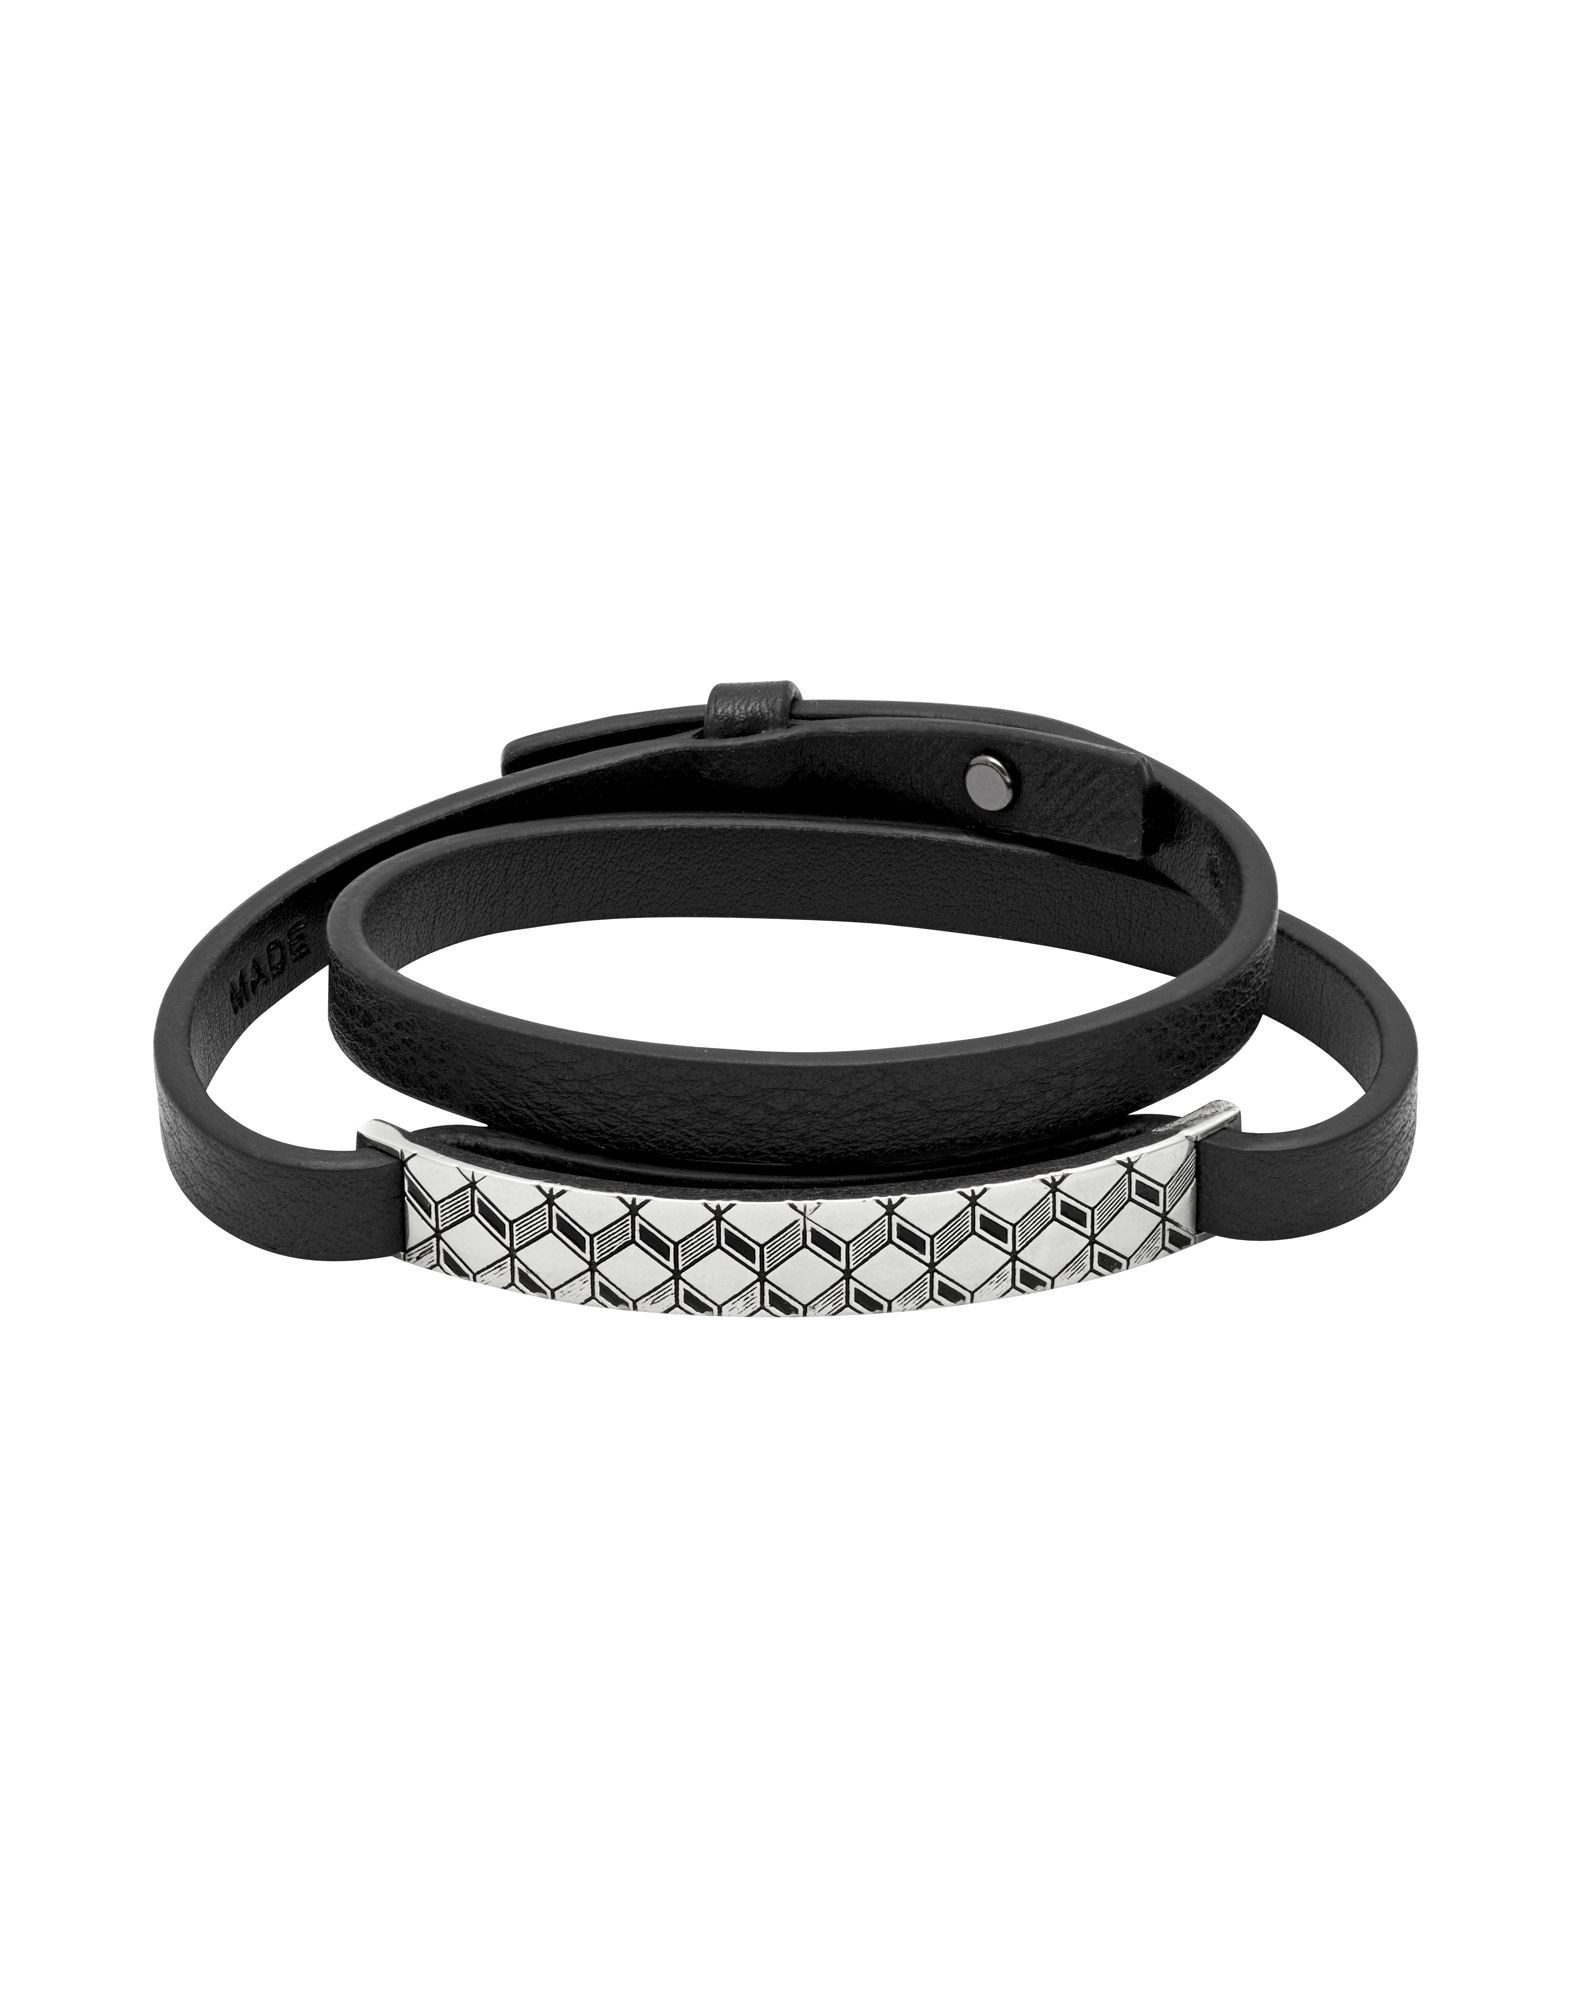 Bracciale Northskull London Kasai Tag Bracelet - Uomo - Acquista online su